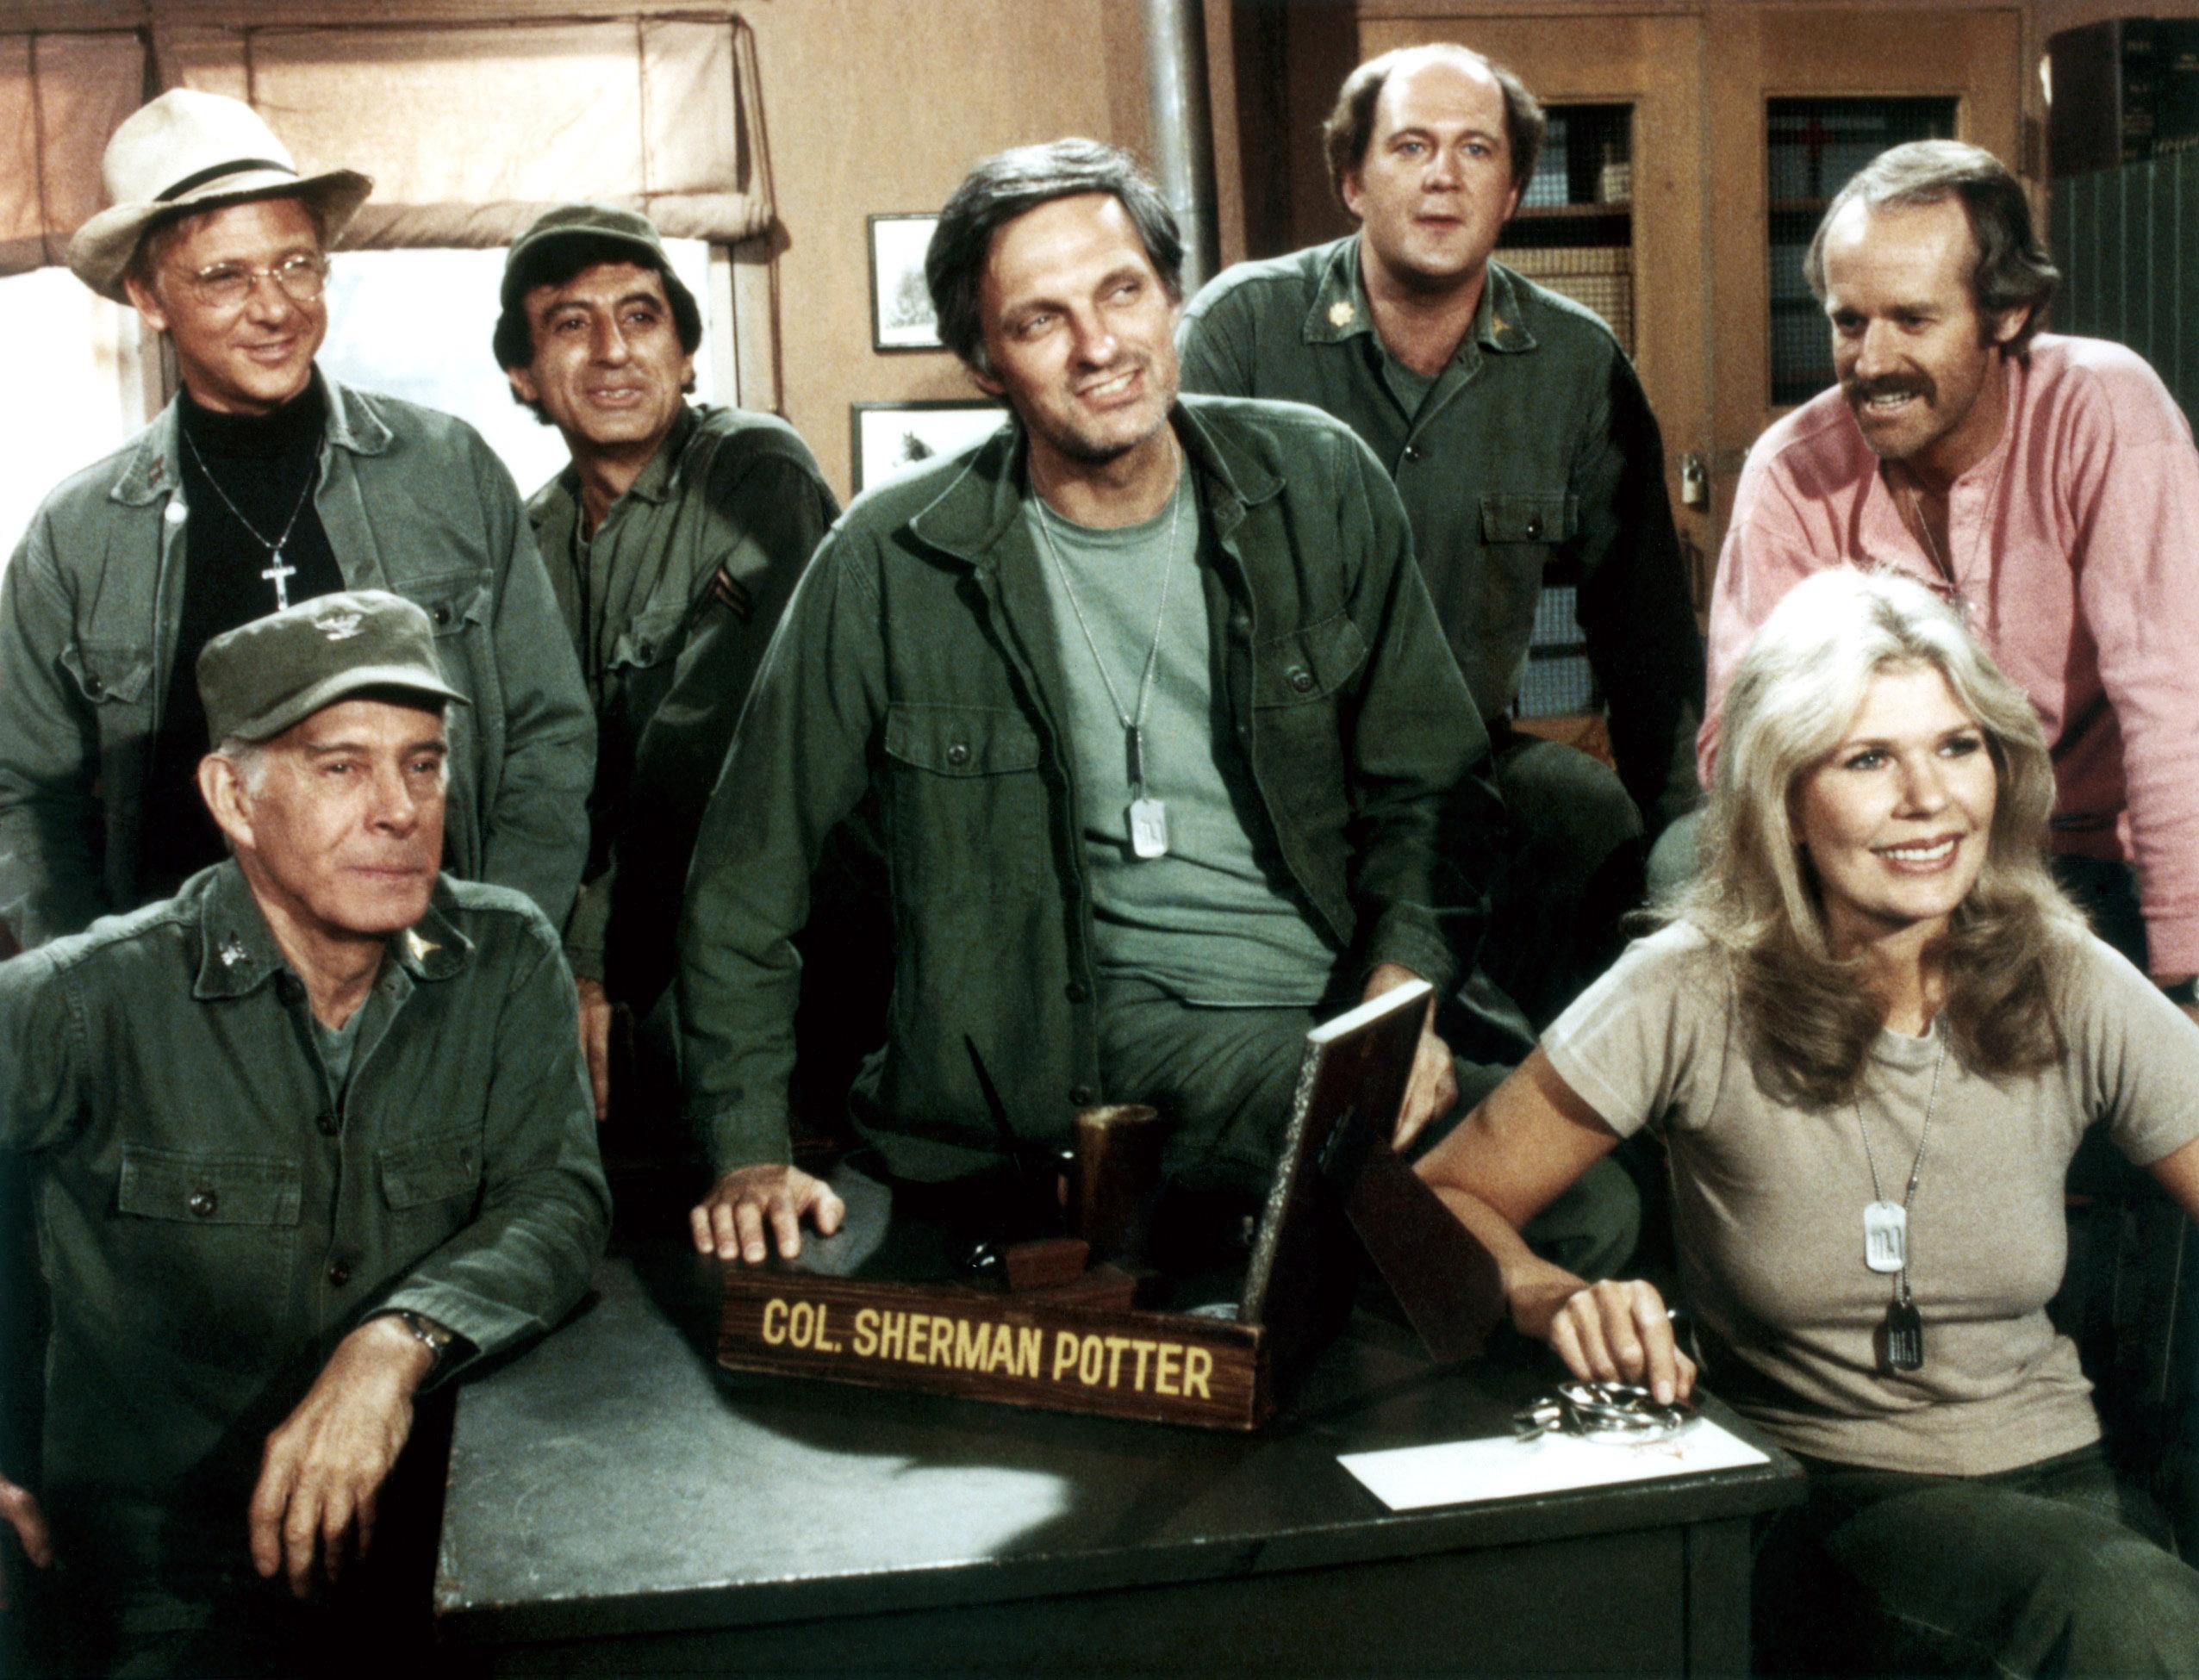 M*A*S*H (aka MASH), from left: Harry Morgan, William Christopher, Jamie Farr, Alan Alda, David Ogden